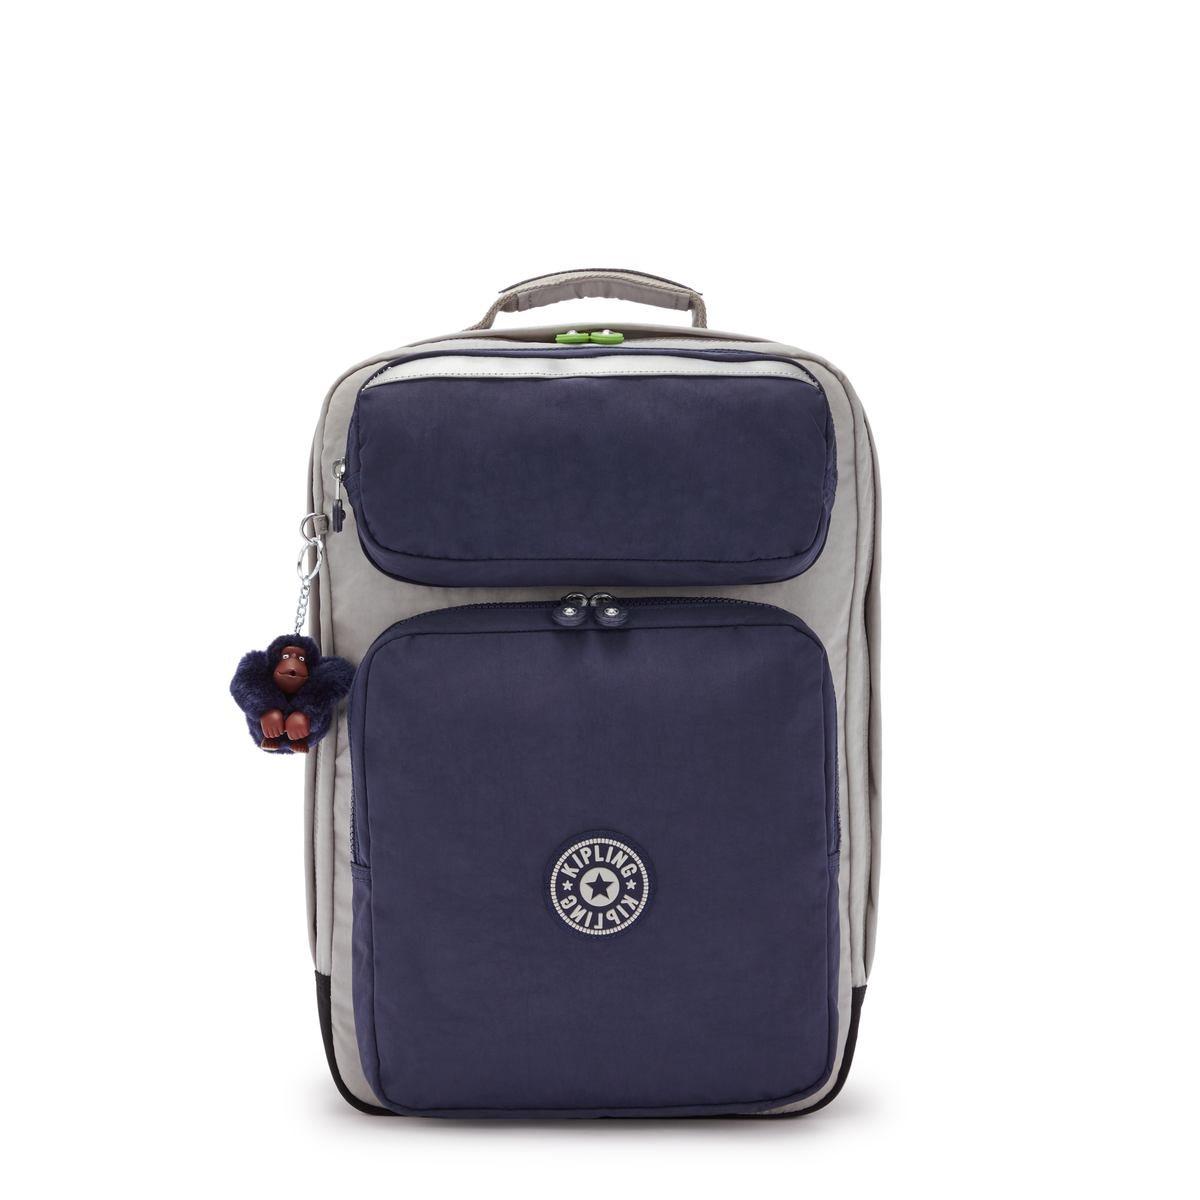 Kipling τσάντα πλάτης θέση PC 15   43x29x24cm Scotty Playful Grey